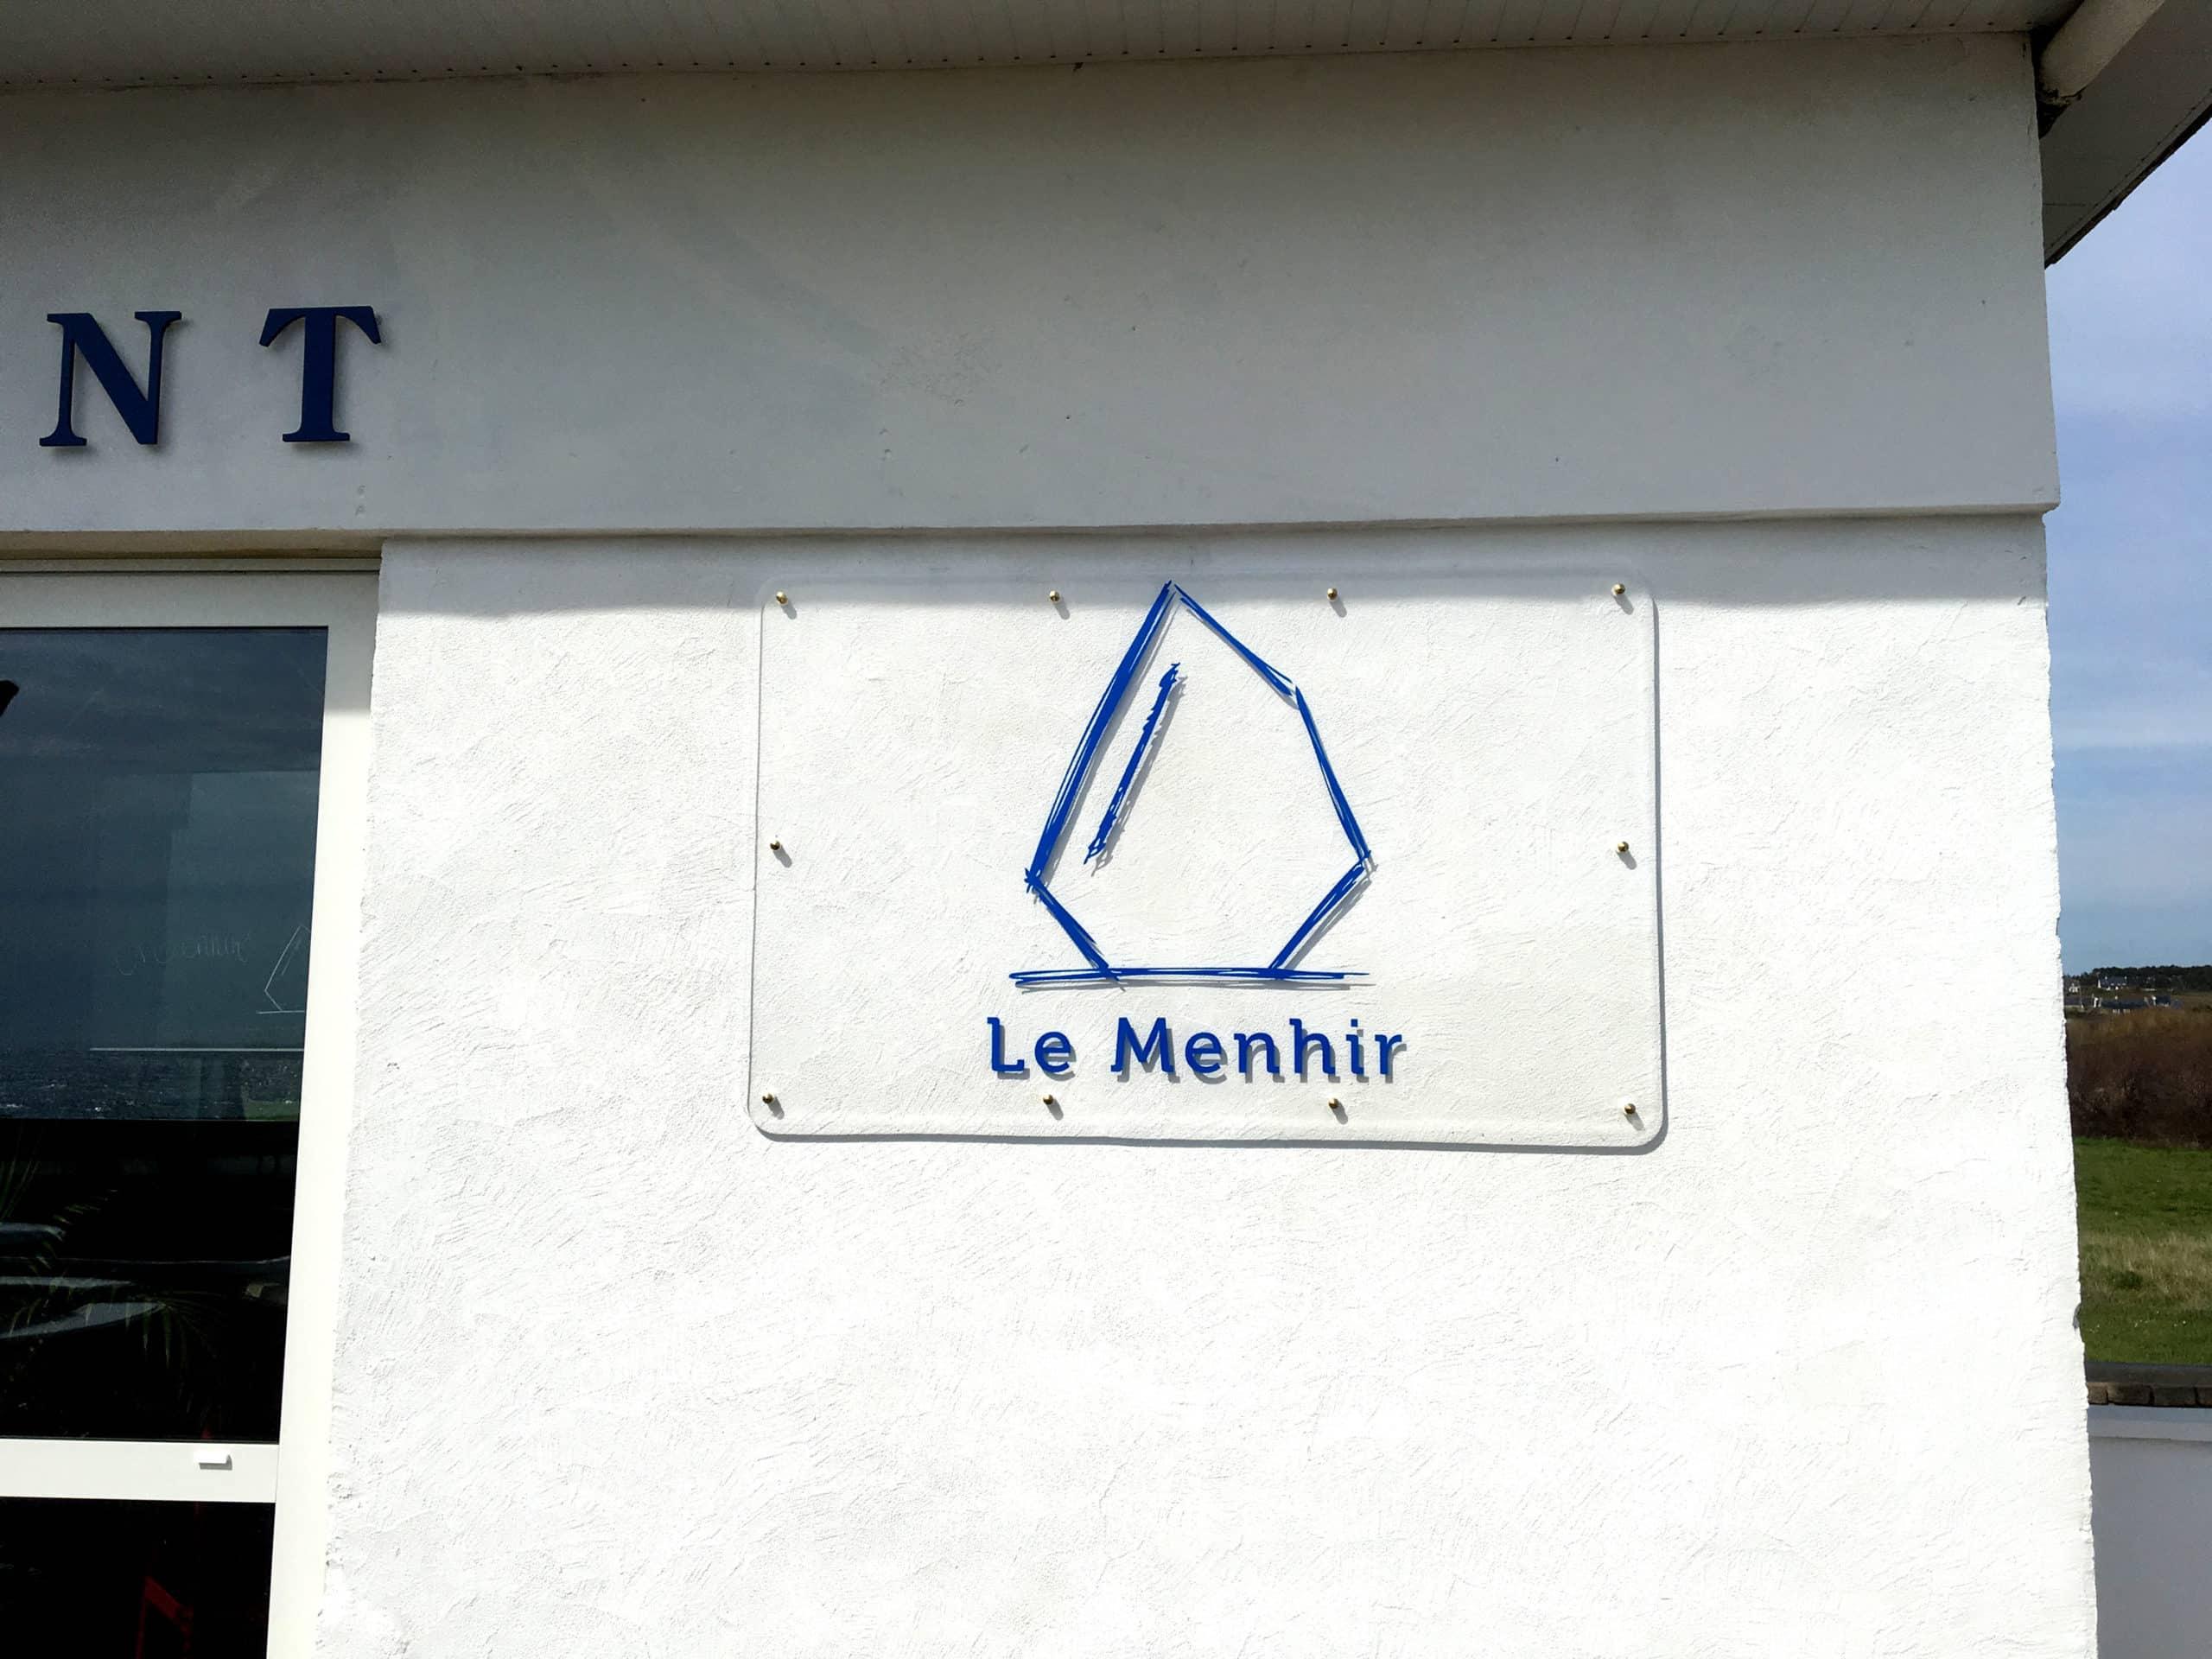 Plaque PMMA transparente avec lettrage adhésif - Restaurant Le Menhir - Plozévet